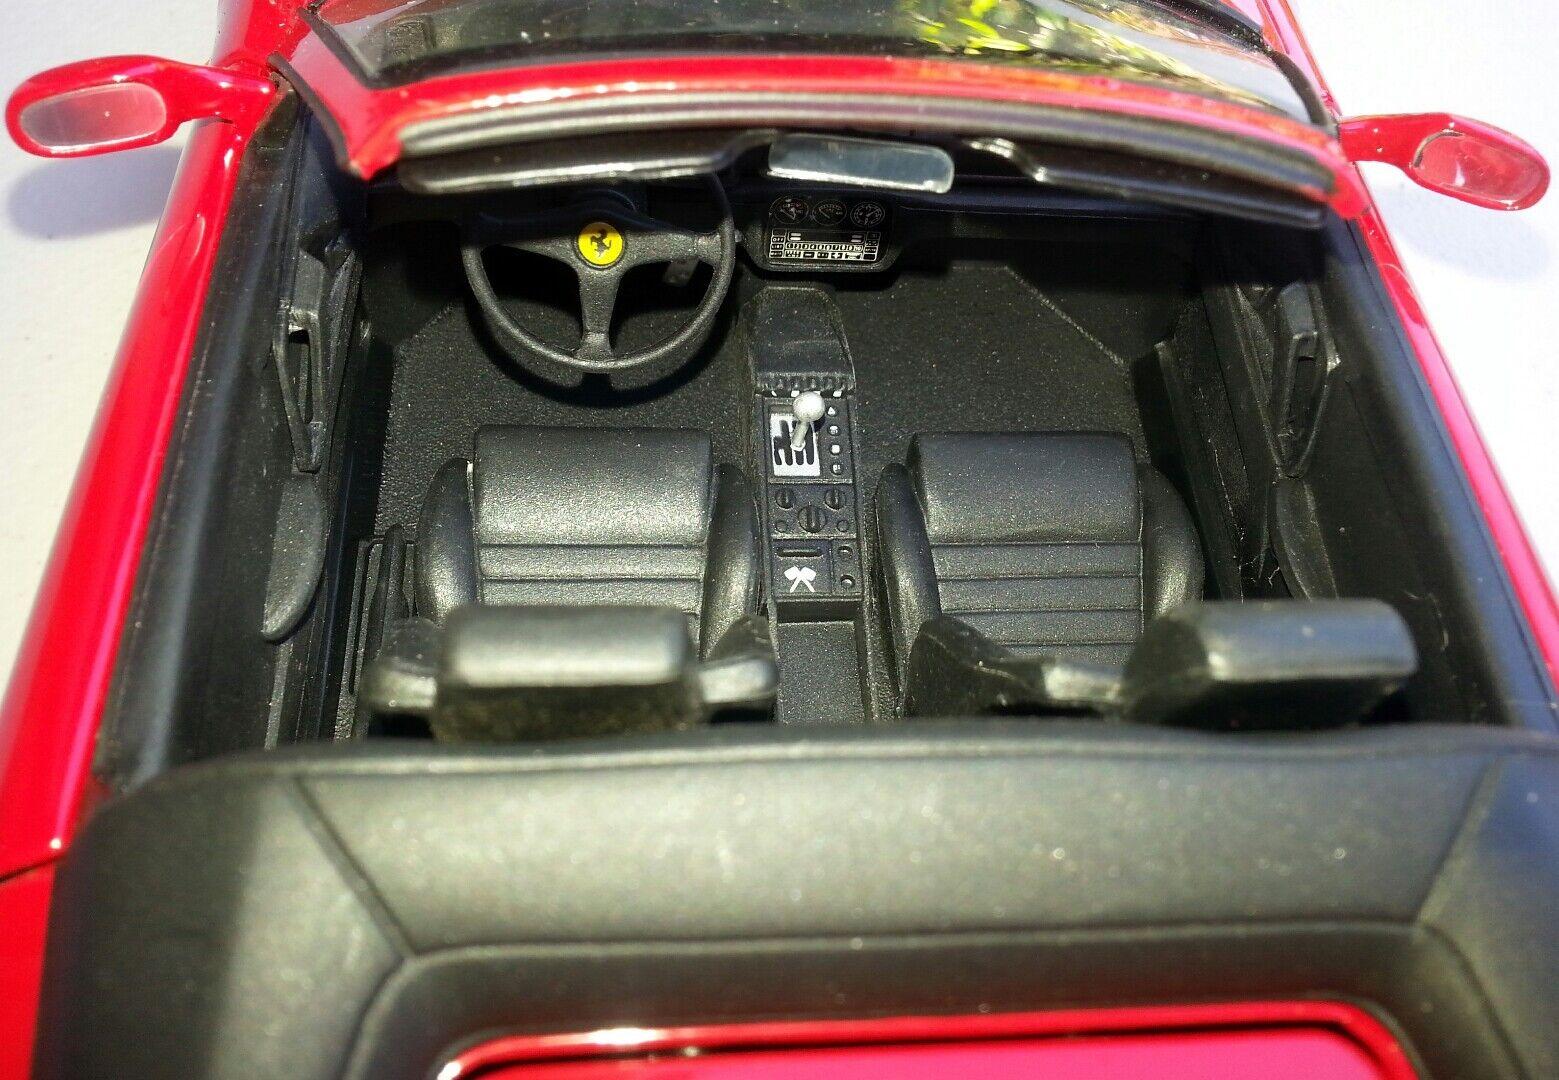 Diecast 1 18 Ferrari F 355 in in in red by UT 7cecfe